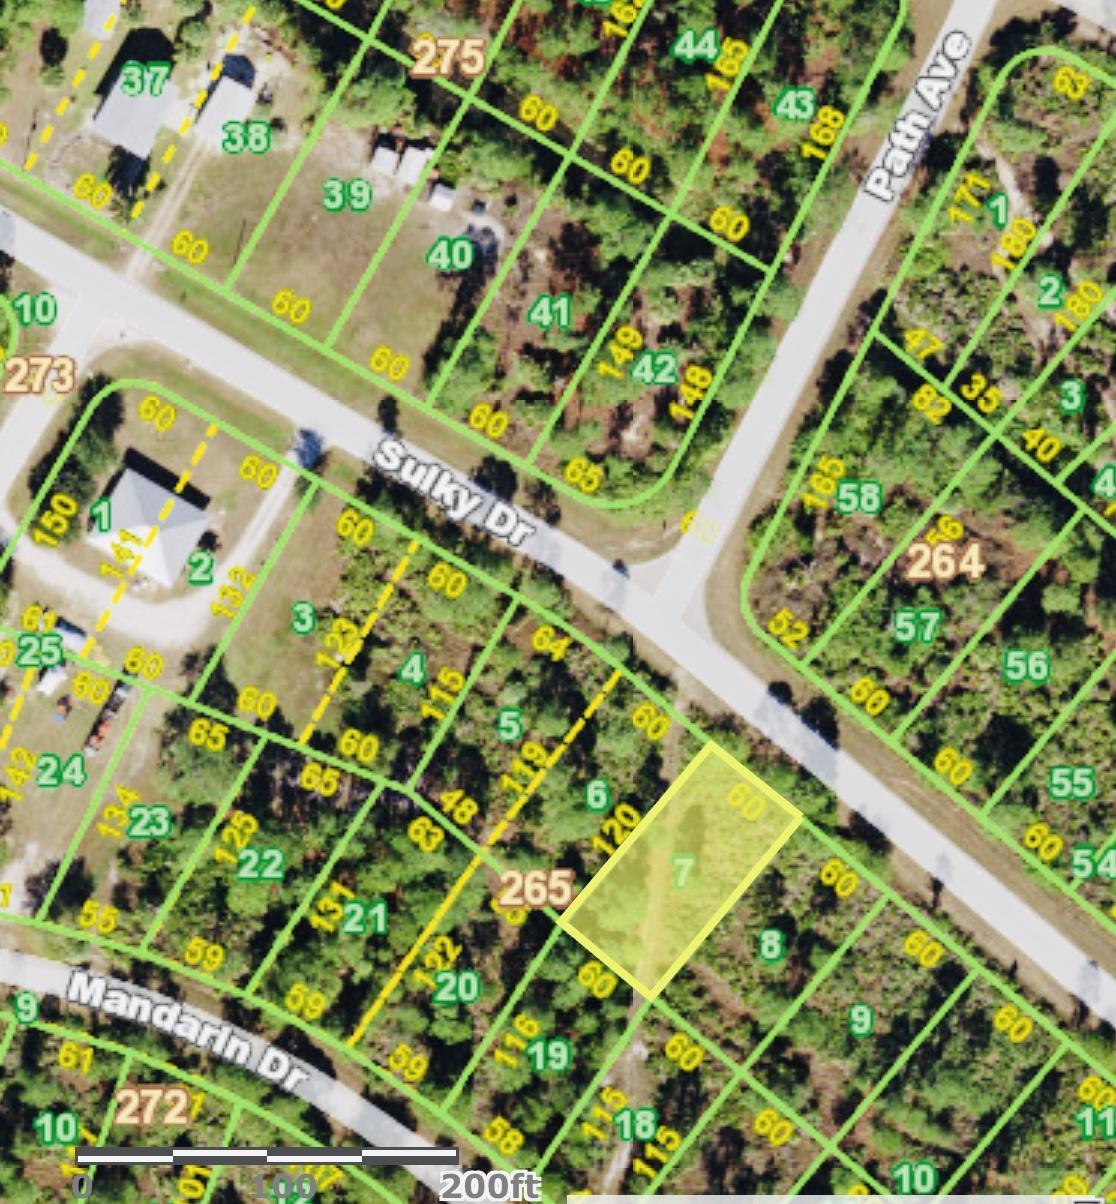 13529 Sulky Drive, Punta Gorda, Florida 33955, ,C,Single family,Sulky,RX-10666987